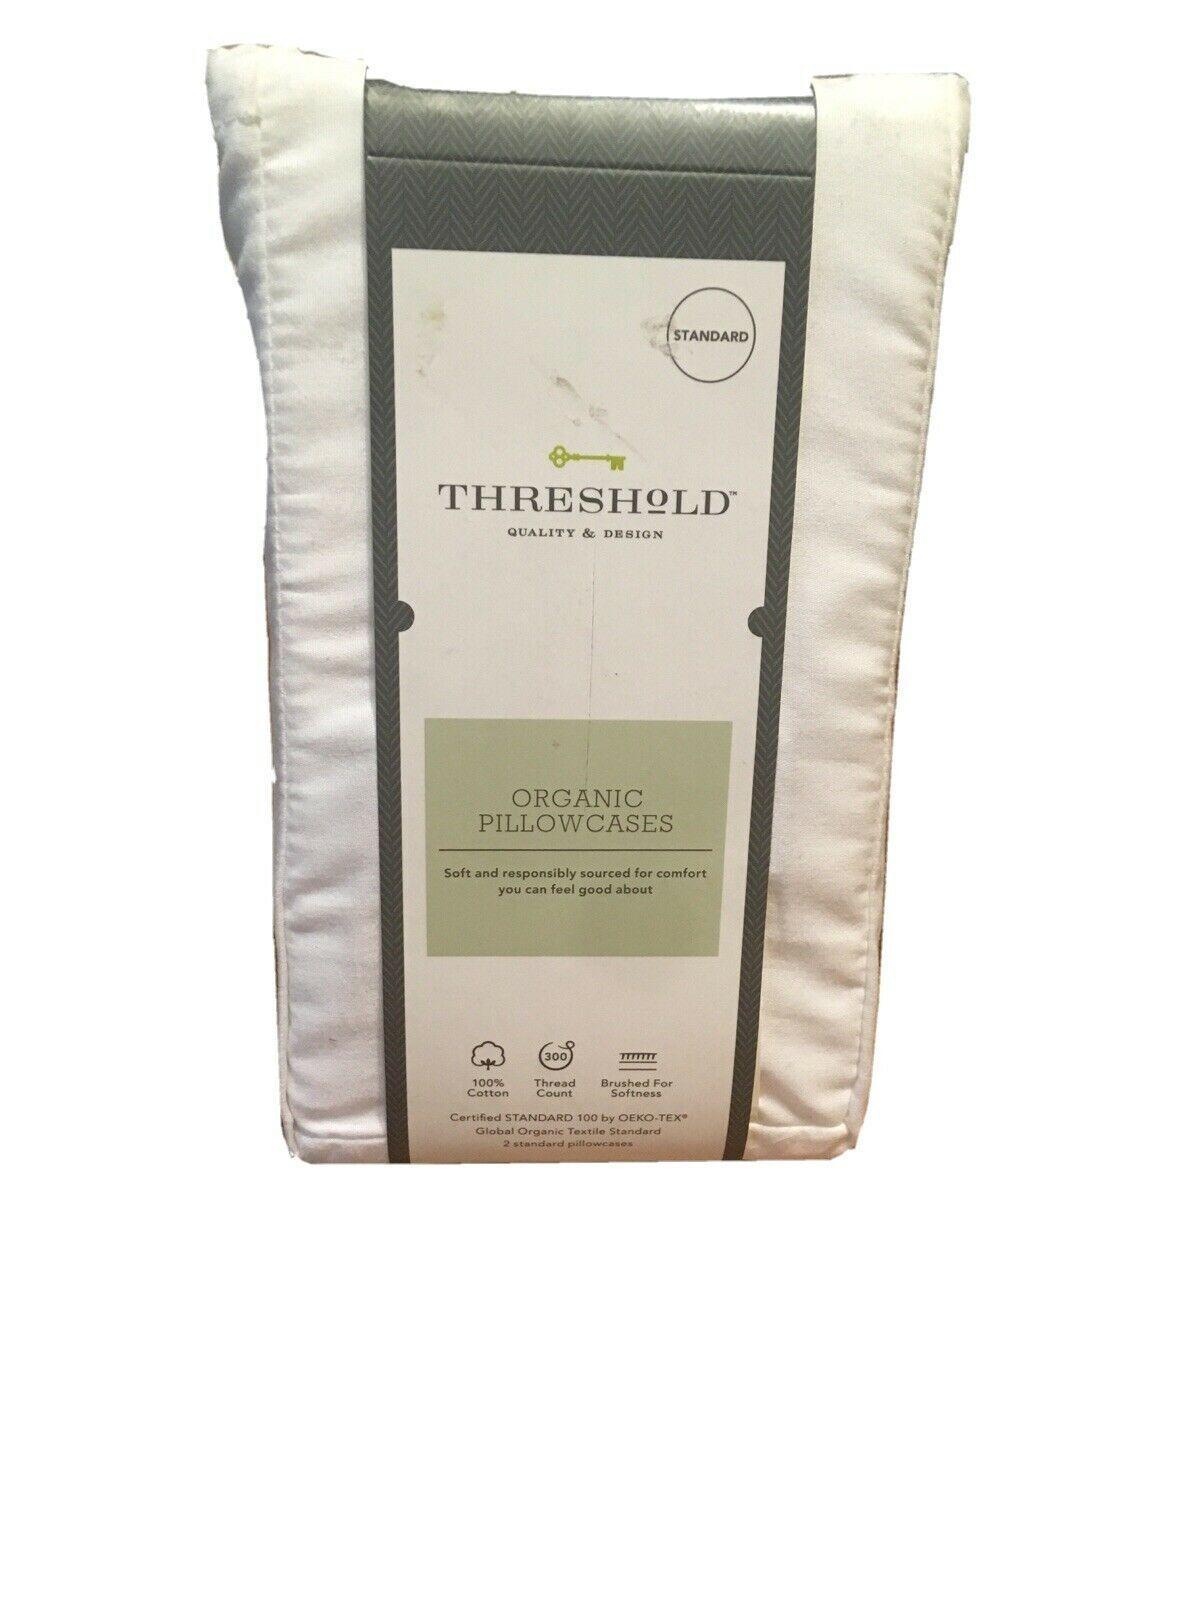 Standard 300 Thread Count ORGANIC Pillowcase Set standard White Threshold NEW! -